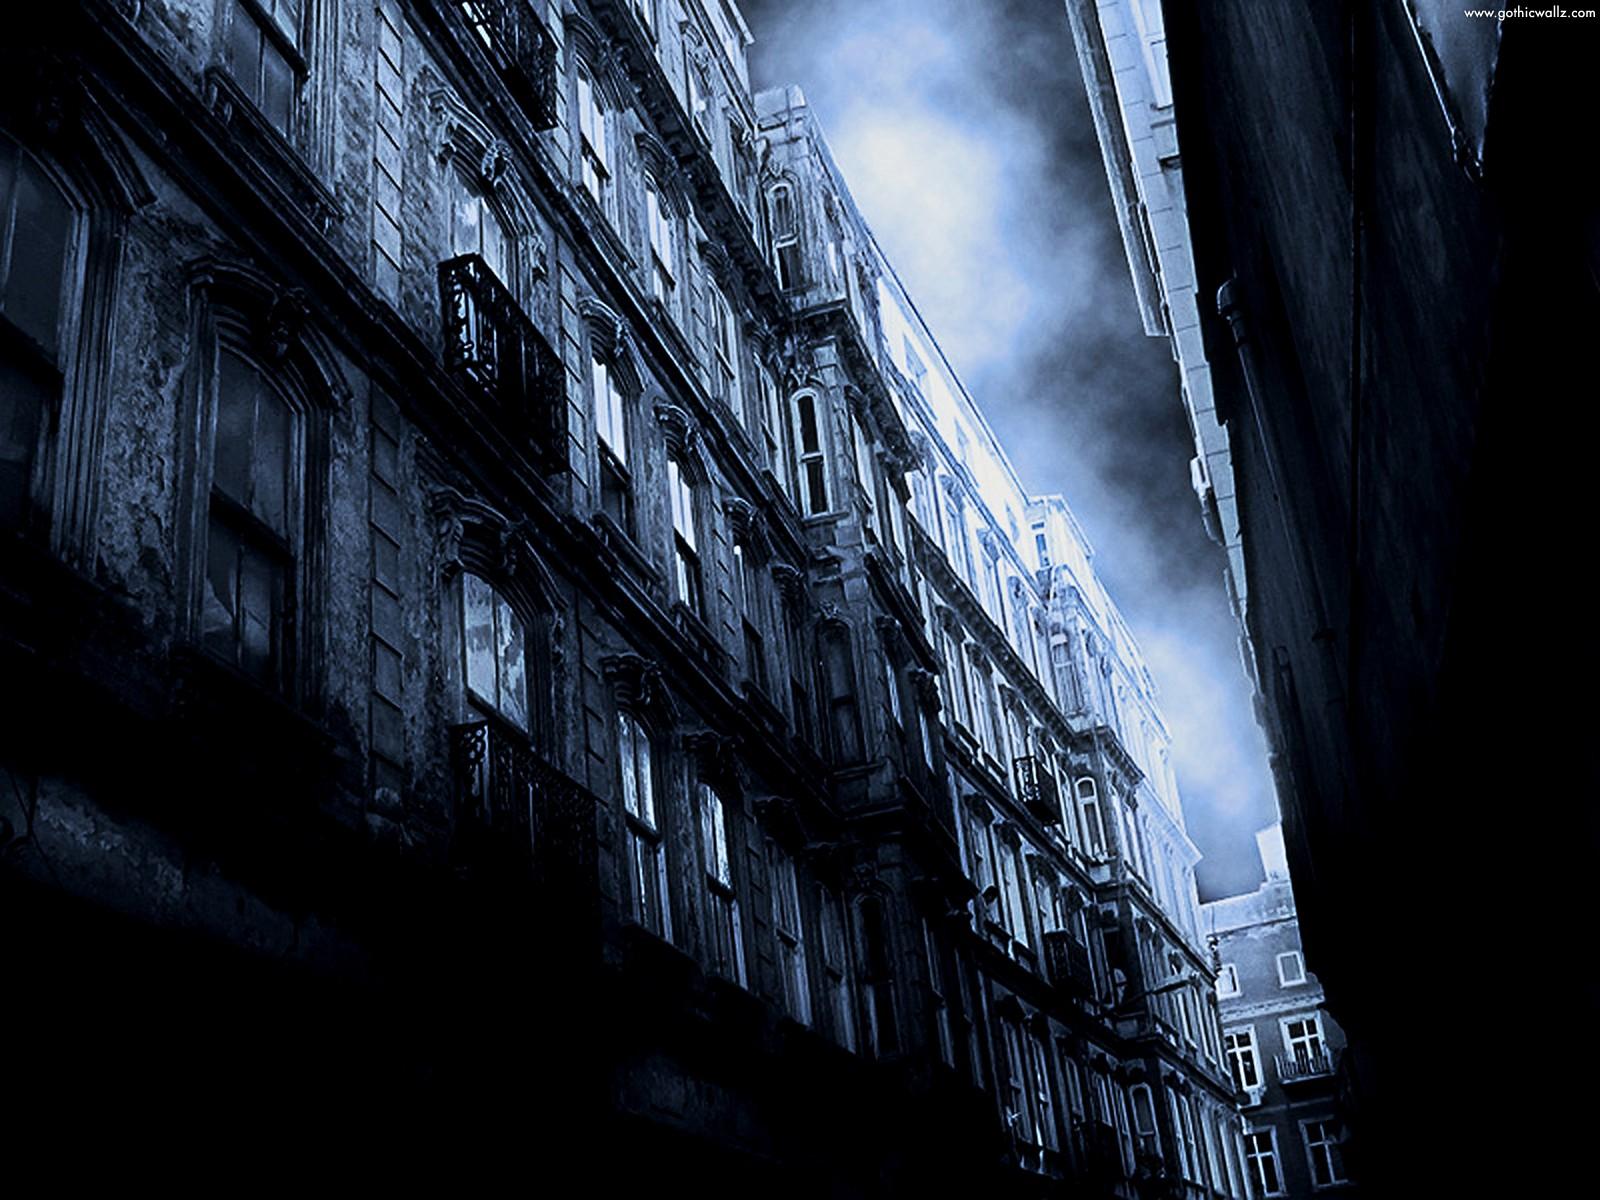 Dark Gothic City Wallpaper HD 154 3161 Wallpaper High Resolution 1600x1200